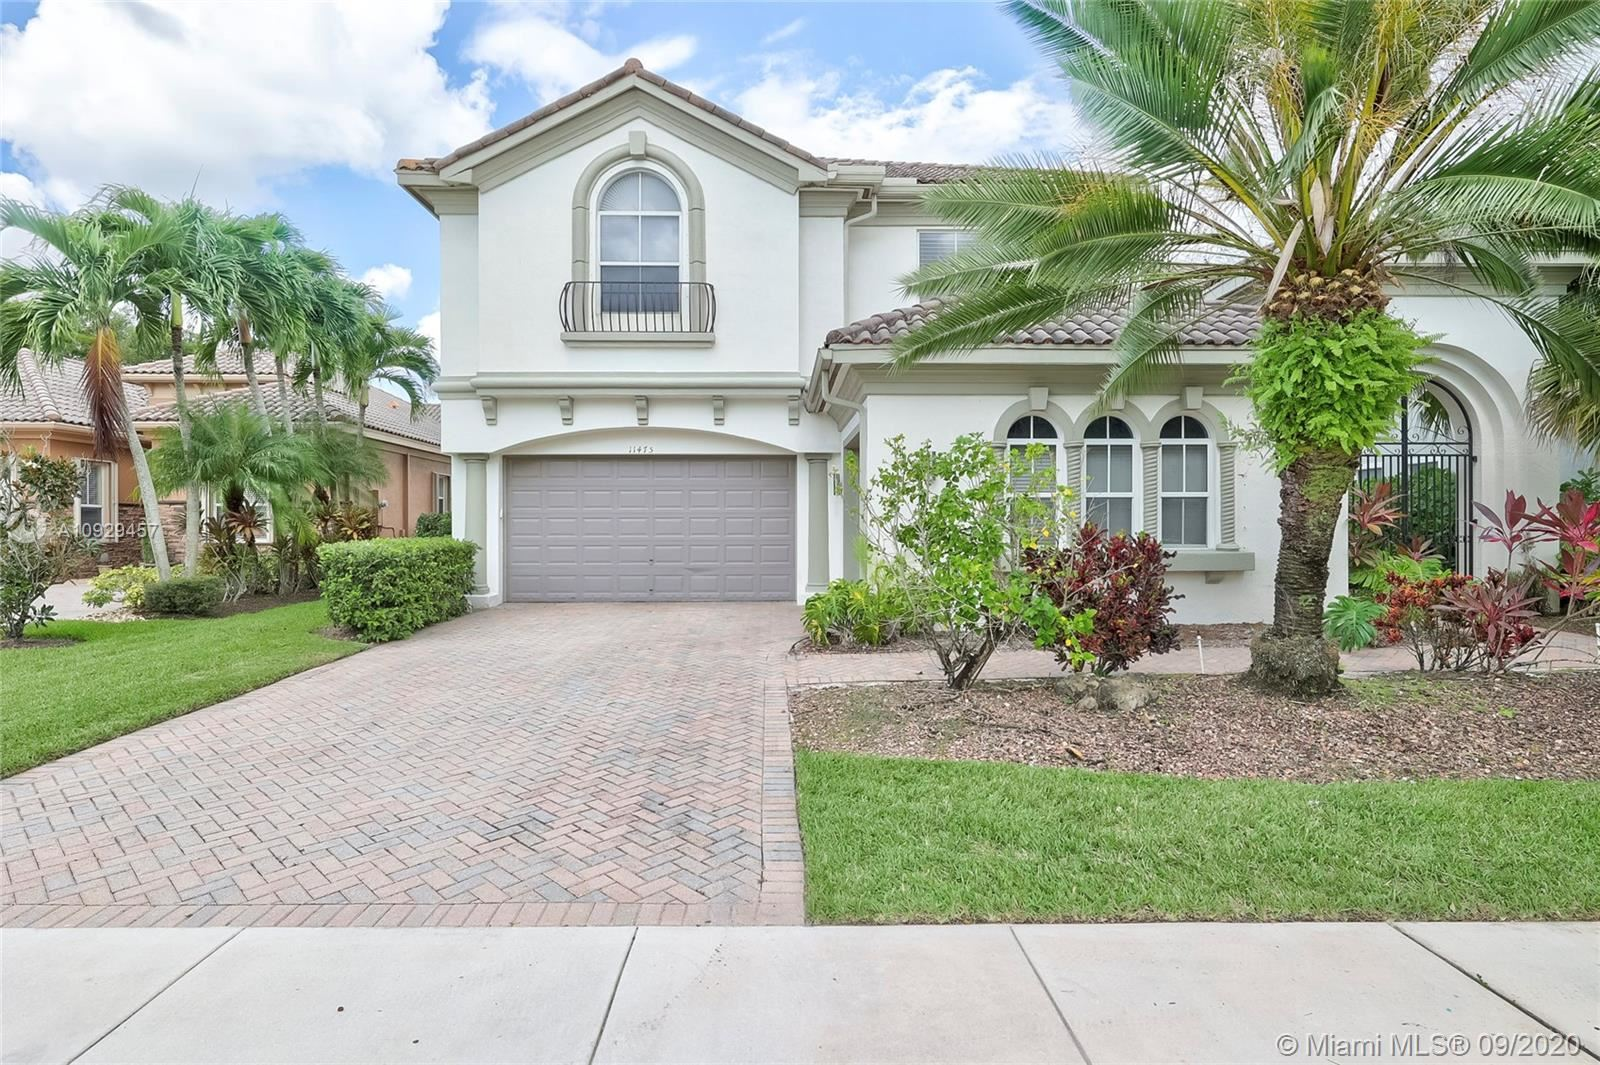 Photo of 11475 NW 75th Mnr, Parkland, FL 33076 (MLS # A10929457)